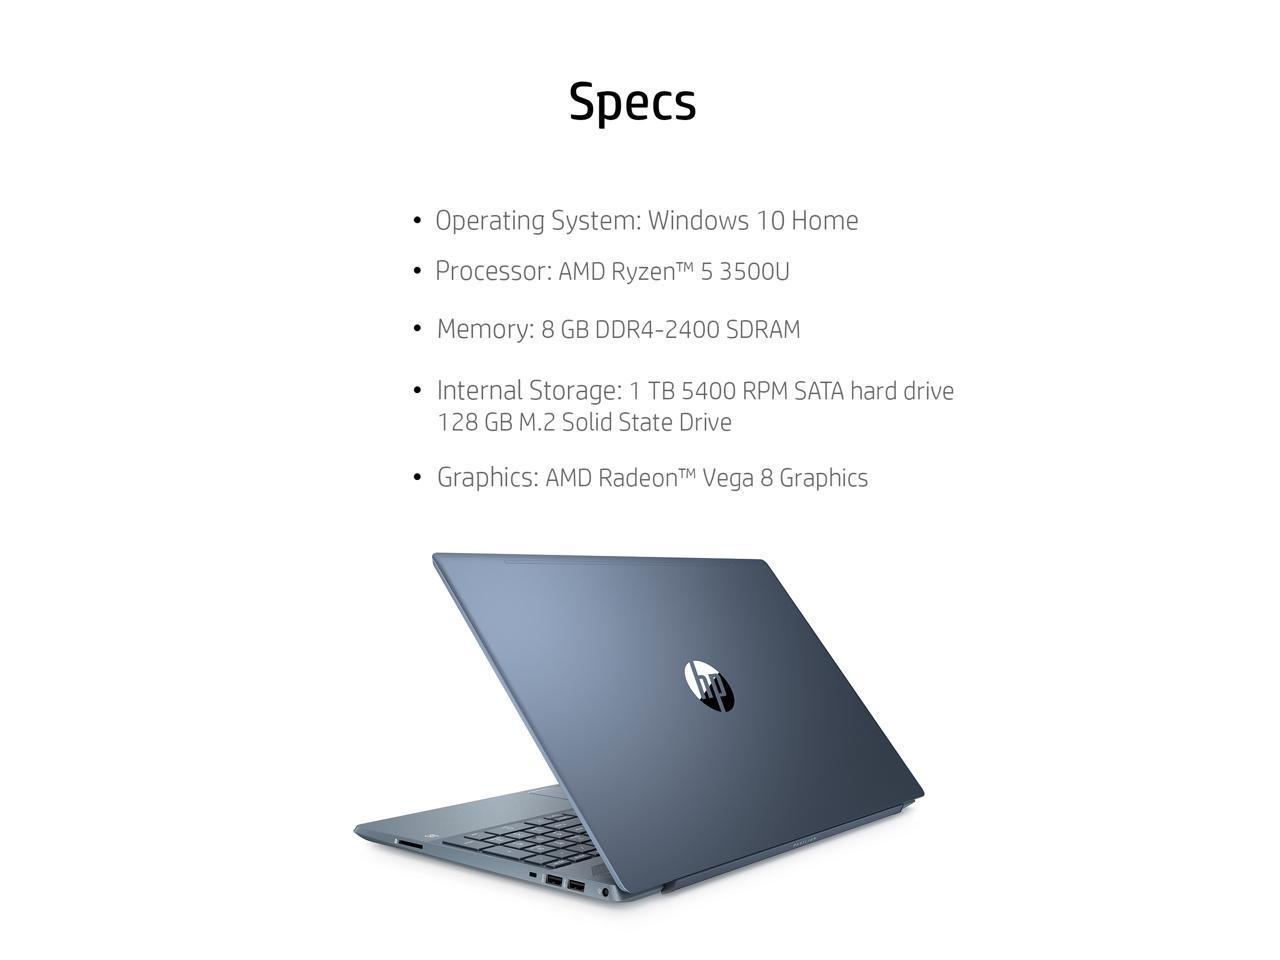 Hp Pavilion Laptop 15 6 Full Hd Display Amd Ryzen 5 3500u Amd Radeon Vega 8 Graphics 8gb Sdram 1tb Hdd 128gb Ssd Horizon Blue 15 Cw1068wm Newegg Com